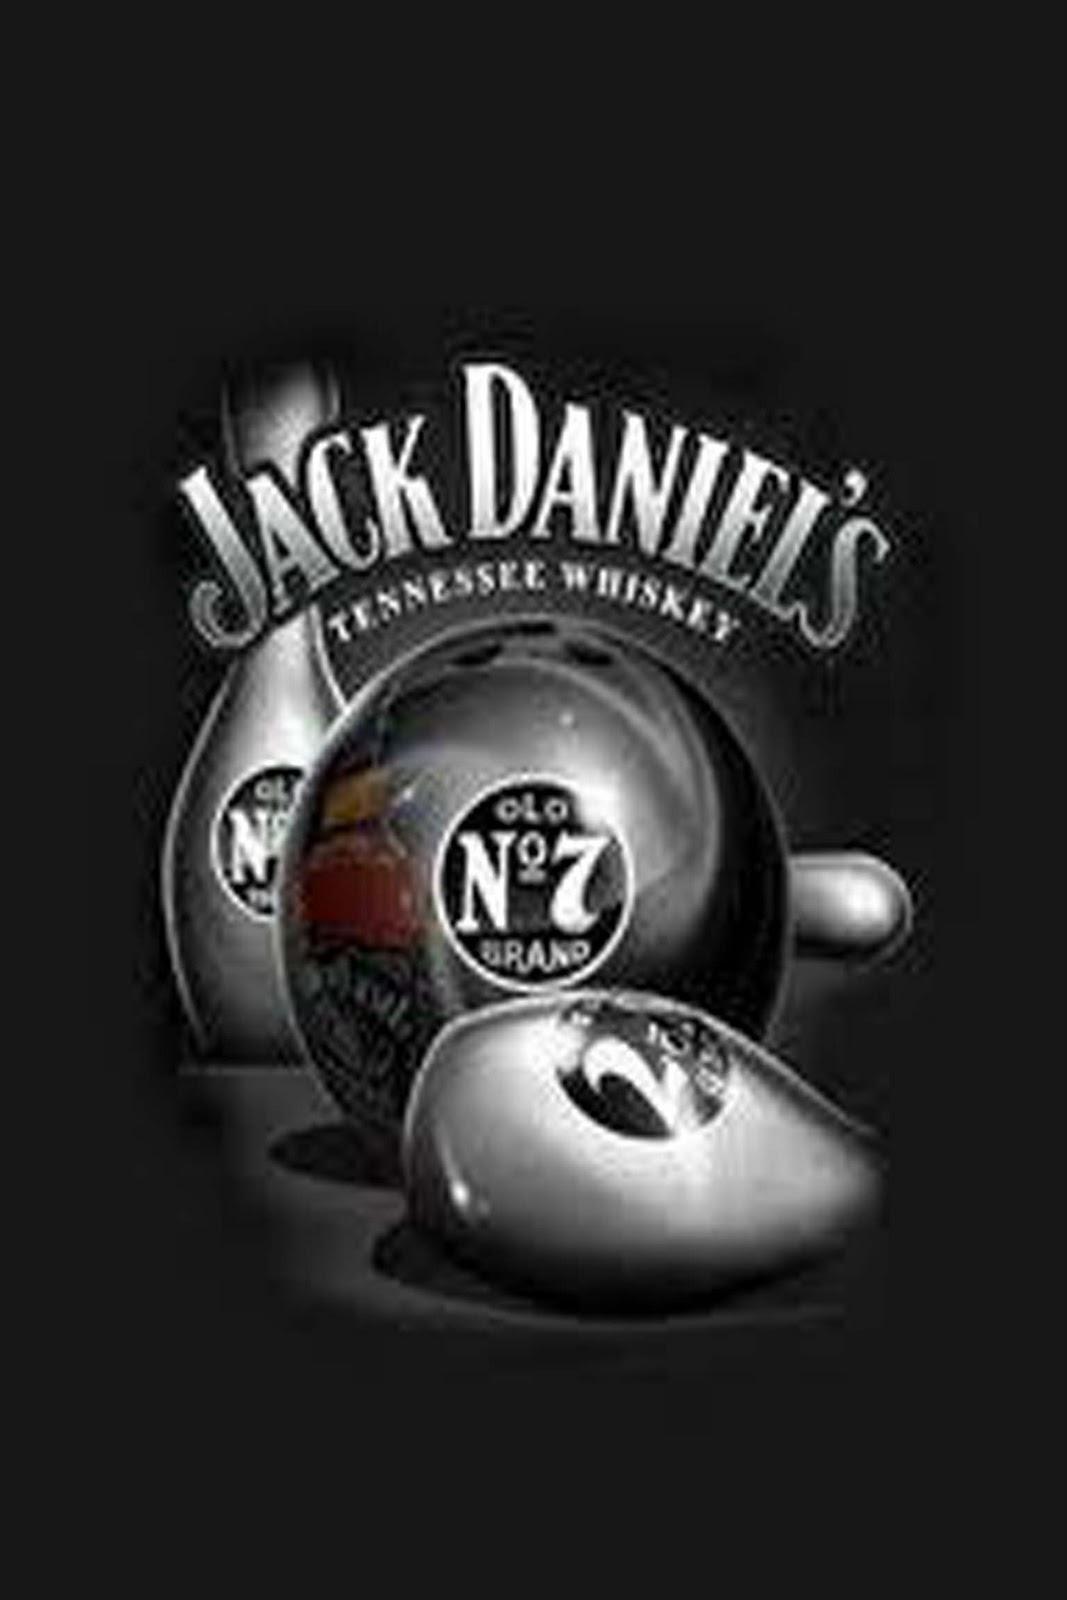 http://3.bp.blogspot.com/-LLqVEXK2fgc/TZi5Rp1ee4I/AAAAAAAAAb8/9ikQR4jebTw/s1600/Jack_Daniels_whiskey_billar.jpg